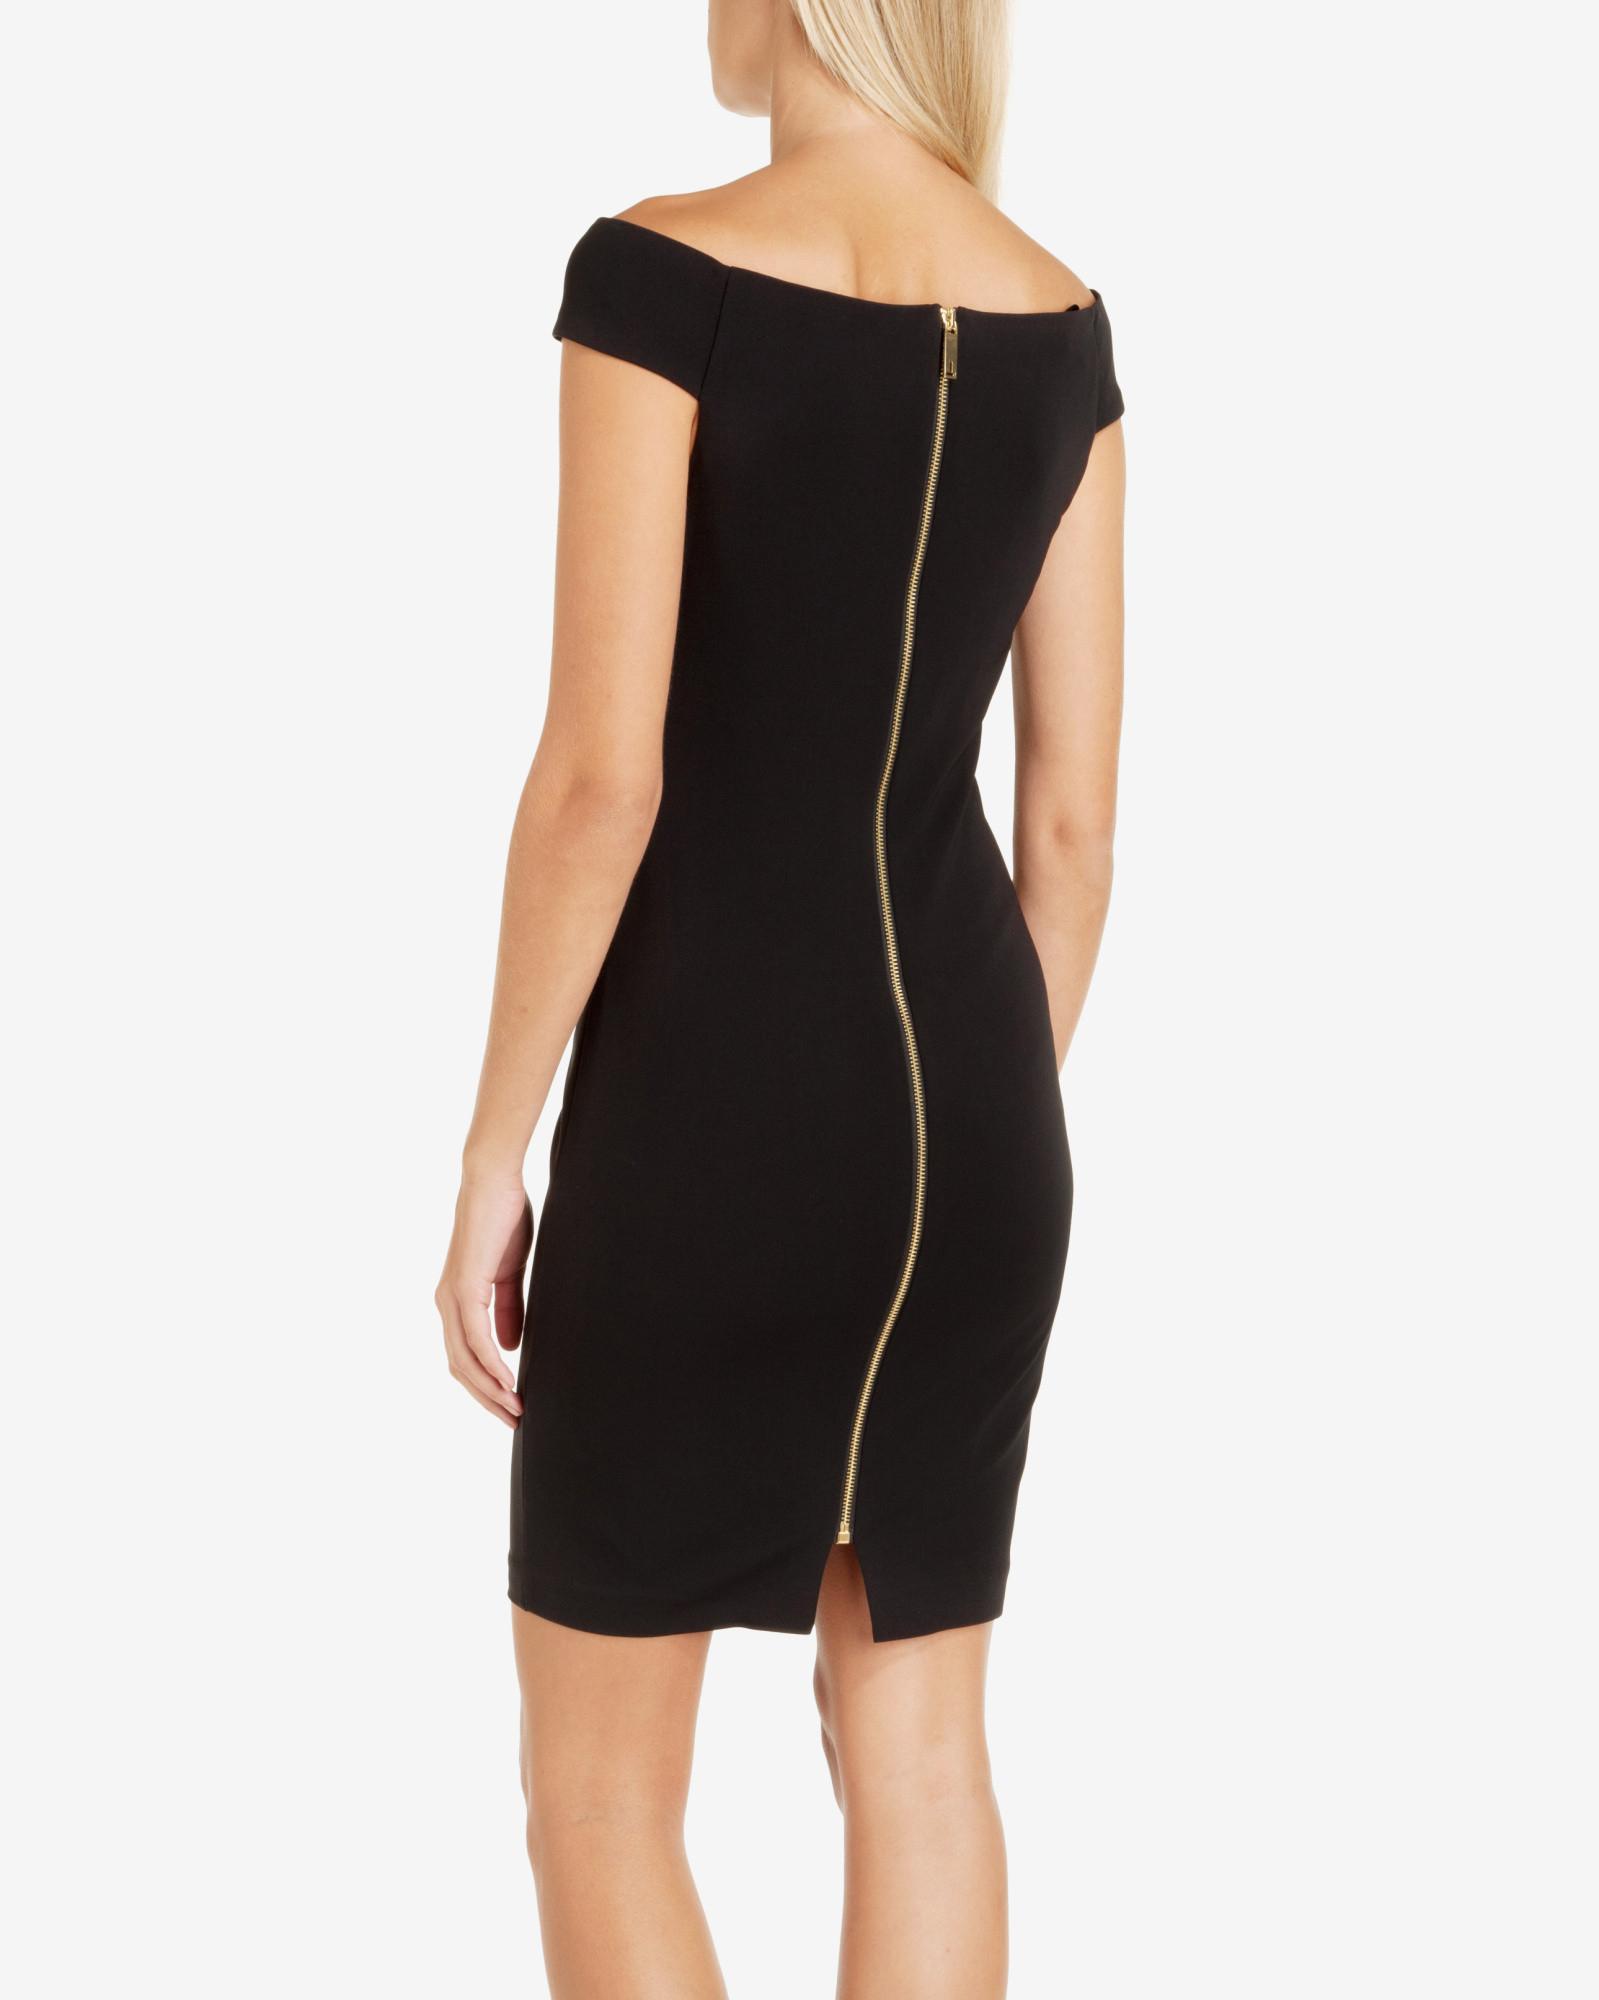 6117afc0043 Ted Baker Bardot Neckline Bodycon Dress in Black - Lyst